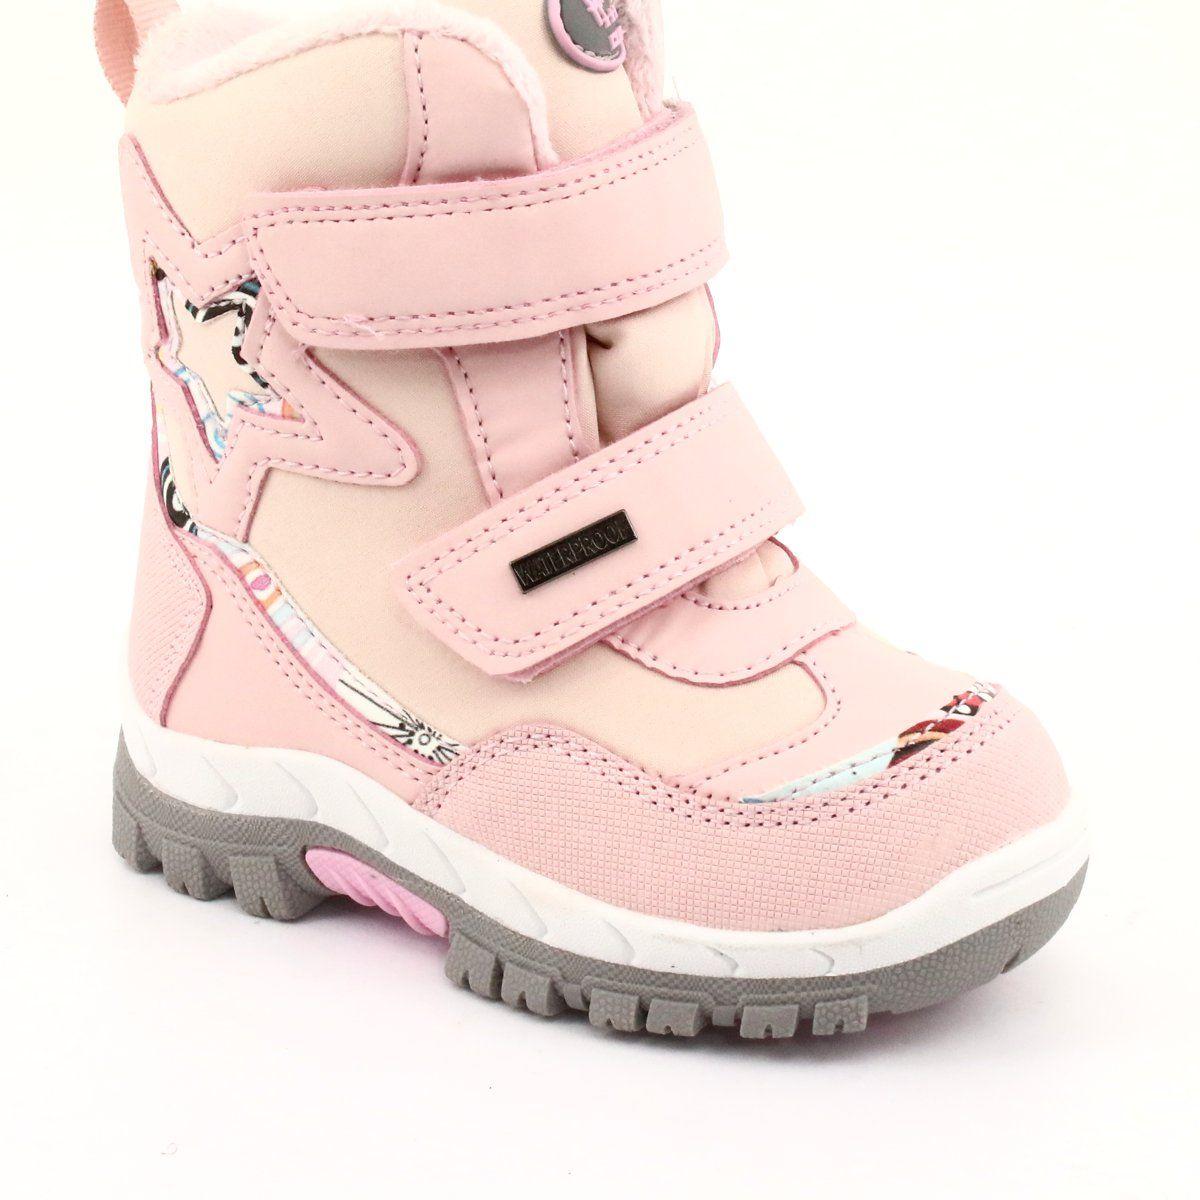 American Club Kozaki Z Membrana Rl37 Gwiazda Rozowe Boots Childrens Boots Girls Shoes